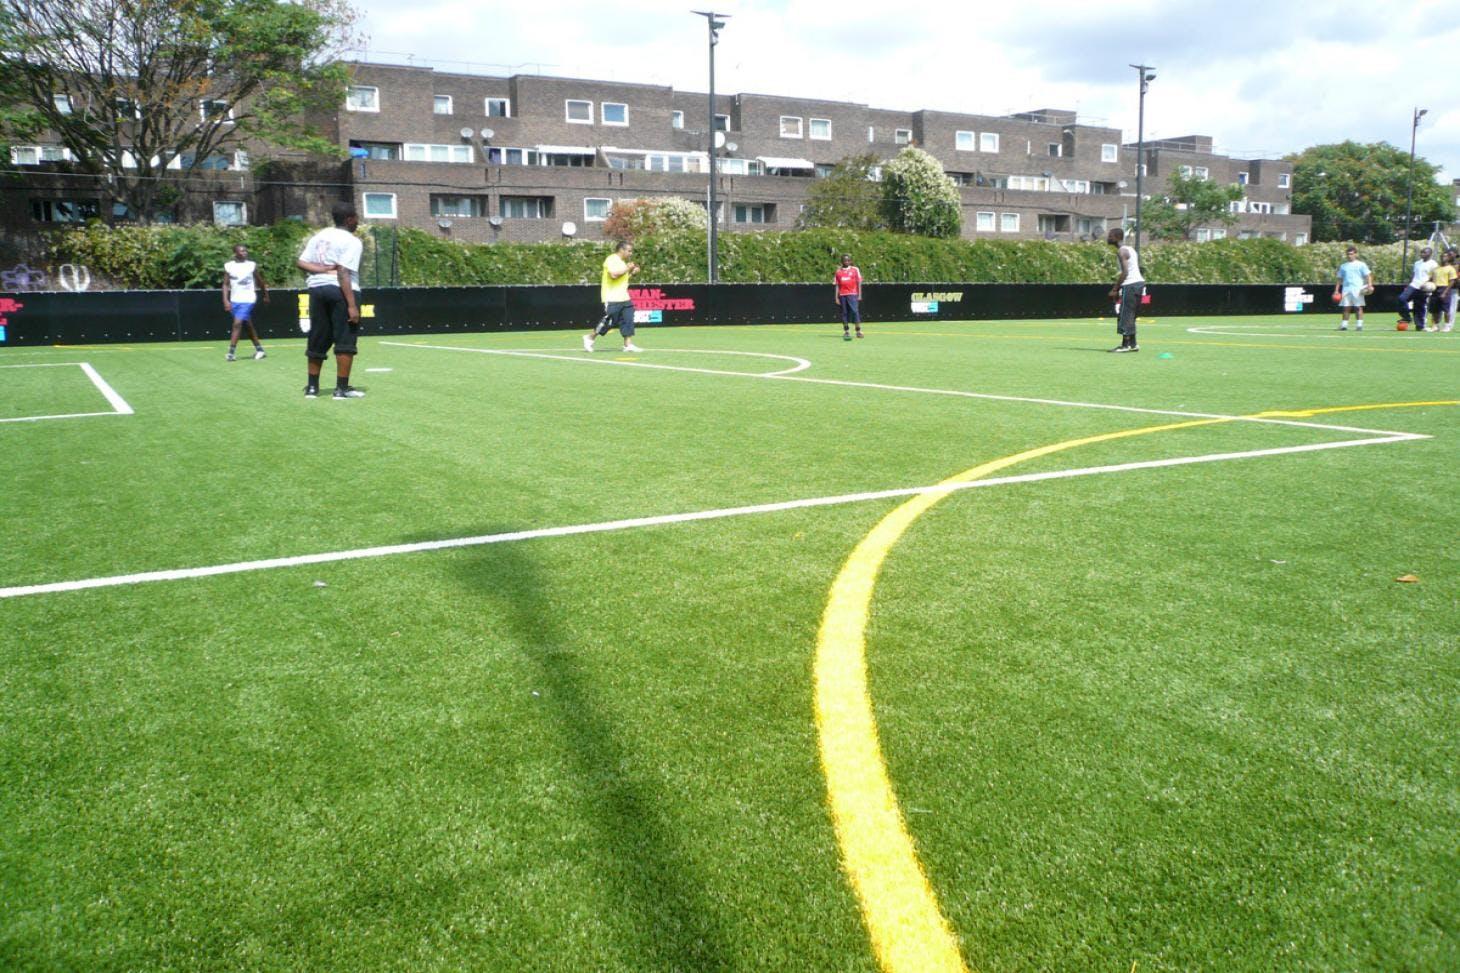 Lilian Baylis Old School Outdoor   Concrete netball court